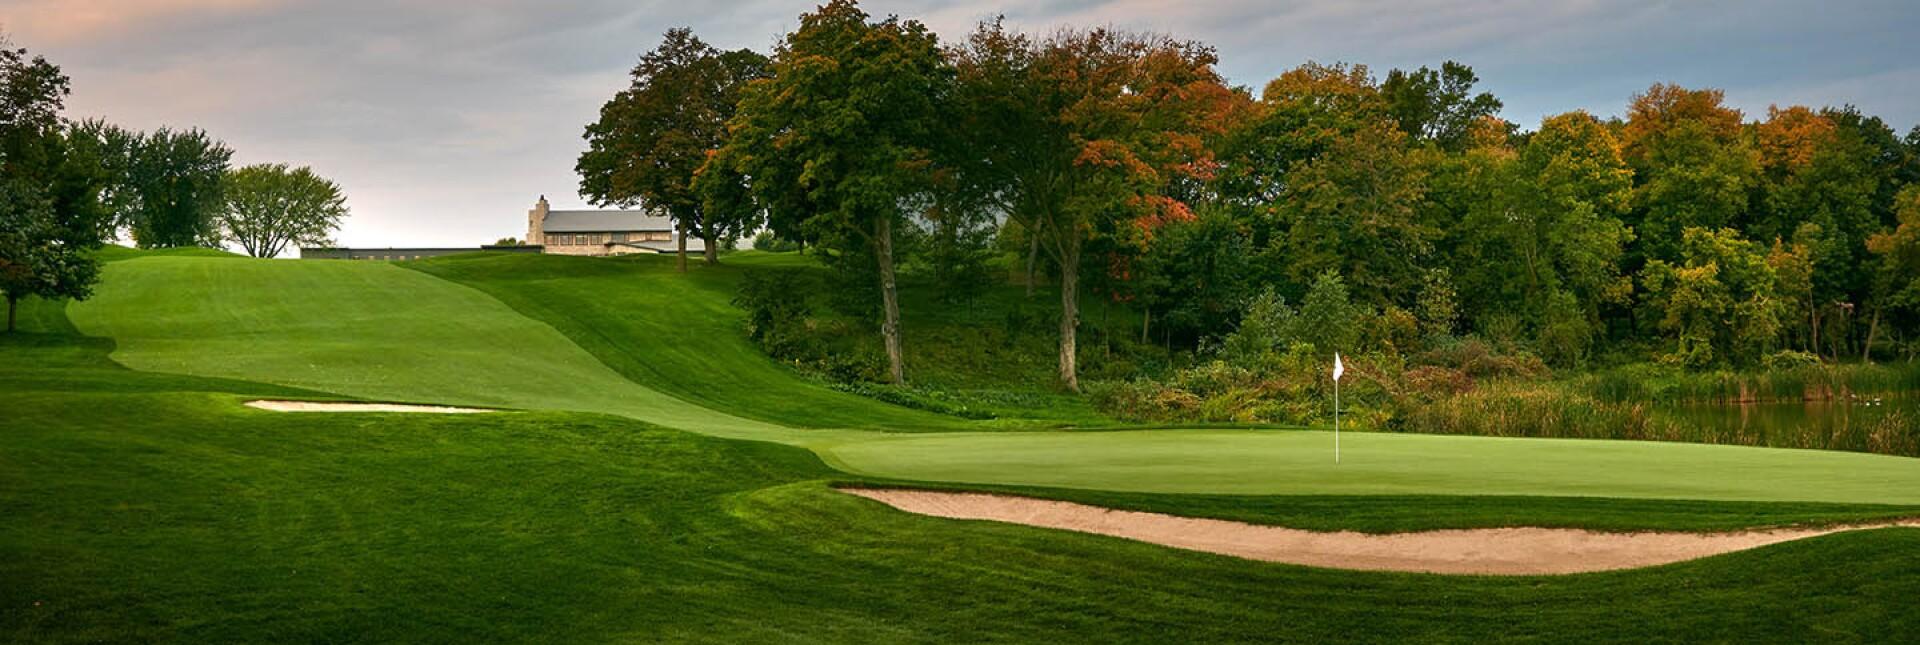 Hazeltine Golf Course - Ryder Cup 2016